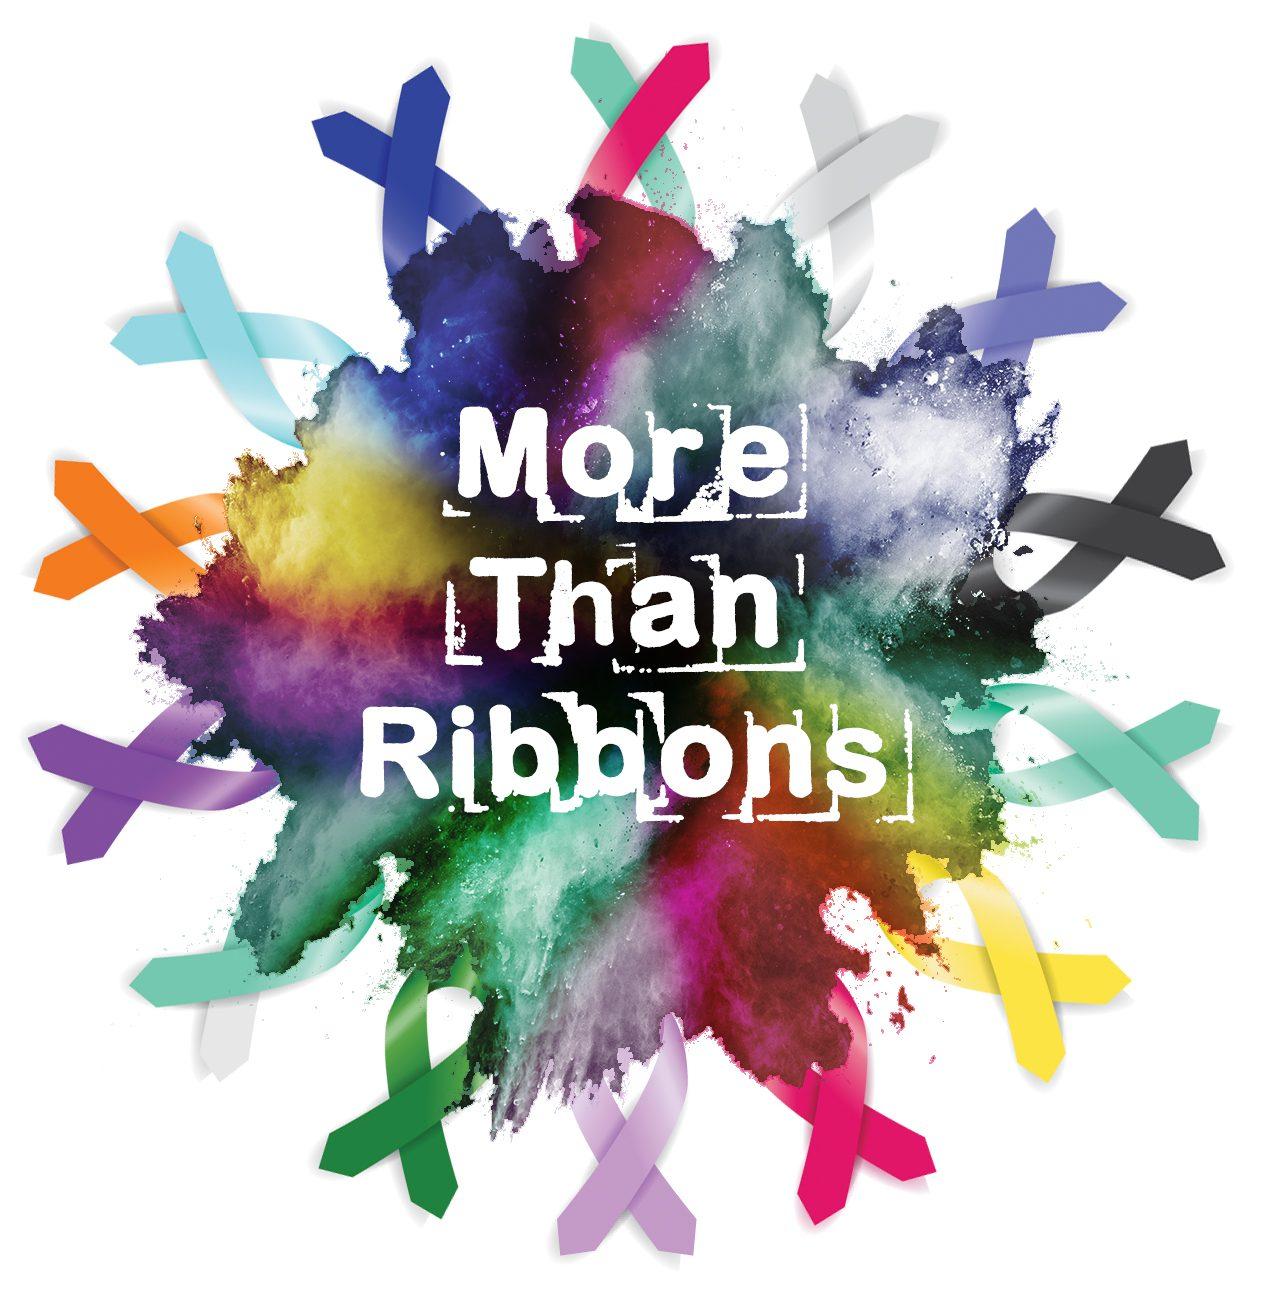 More Than Ribbons